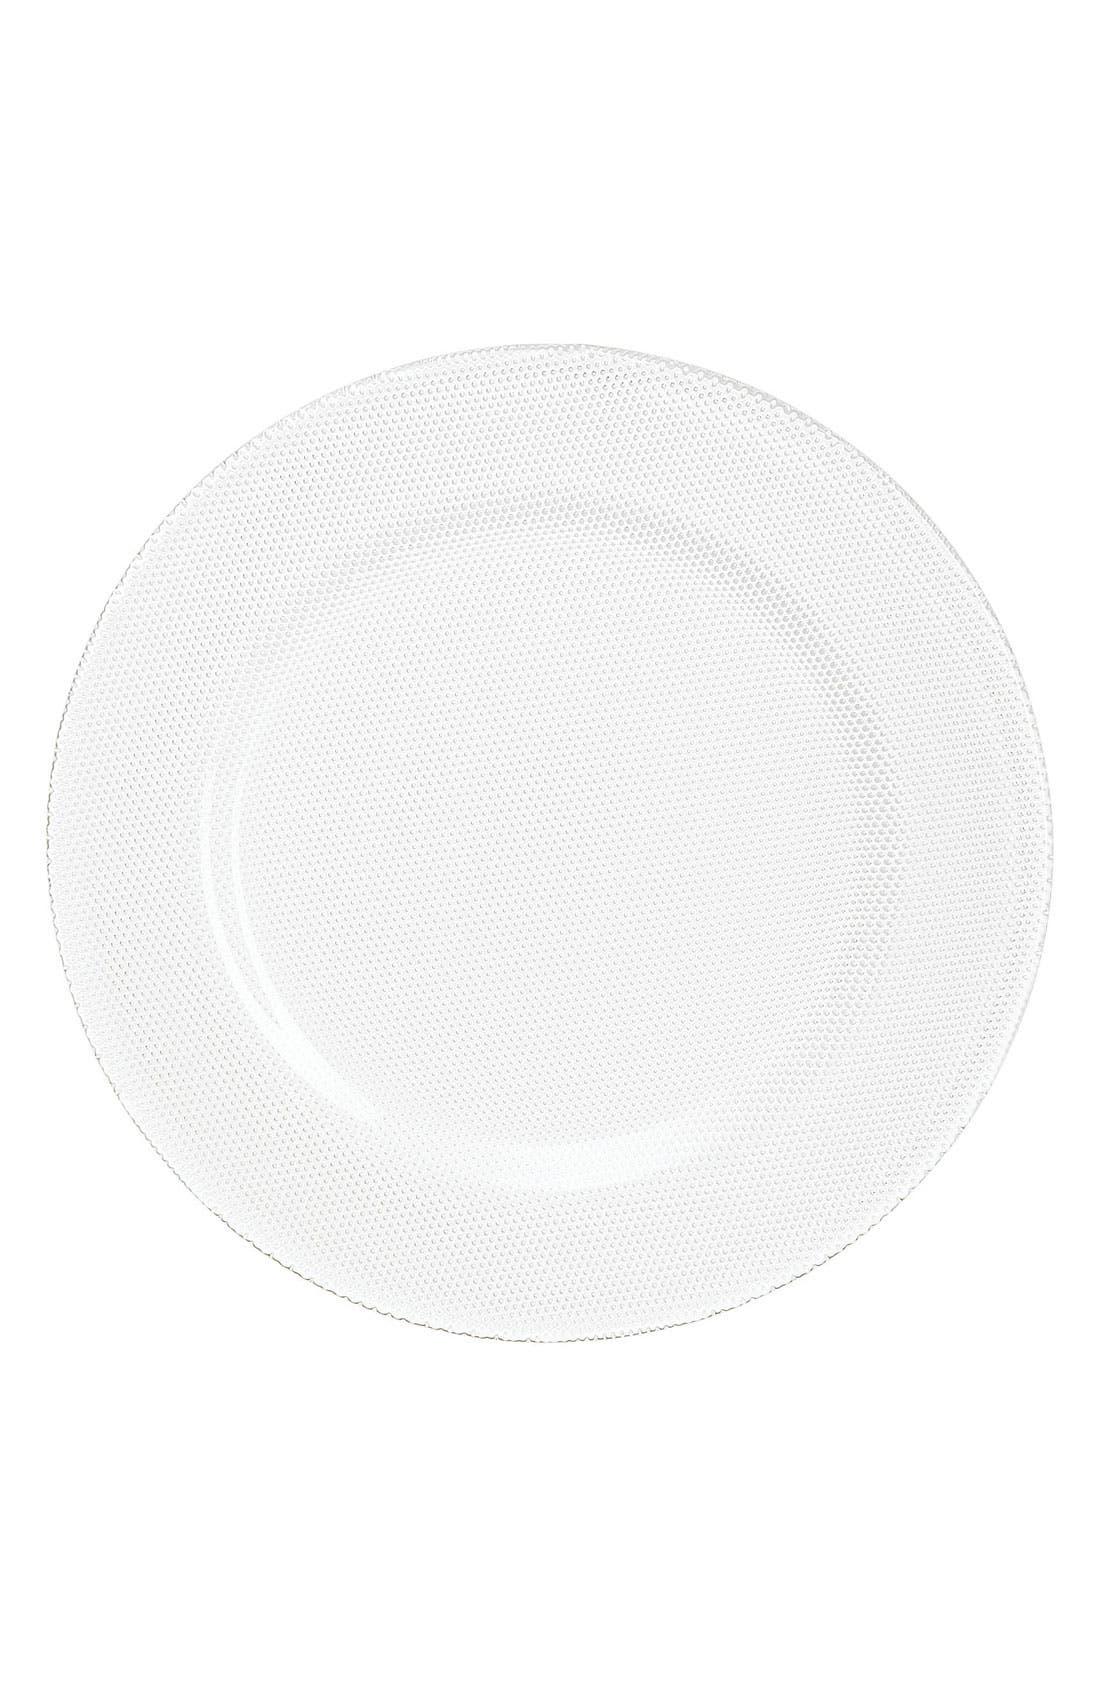 'Limelight' Dinner Plate,                             Main thumbnail 1, color,                             960